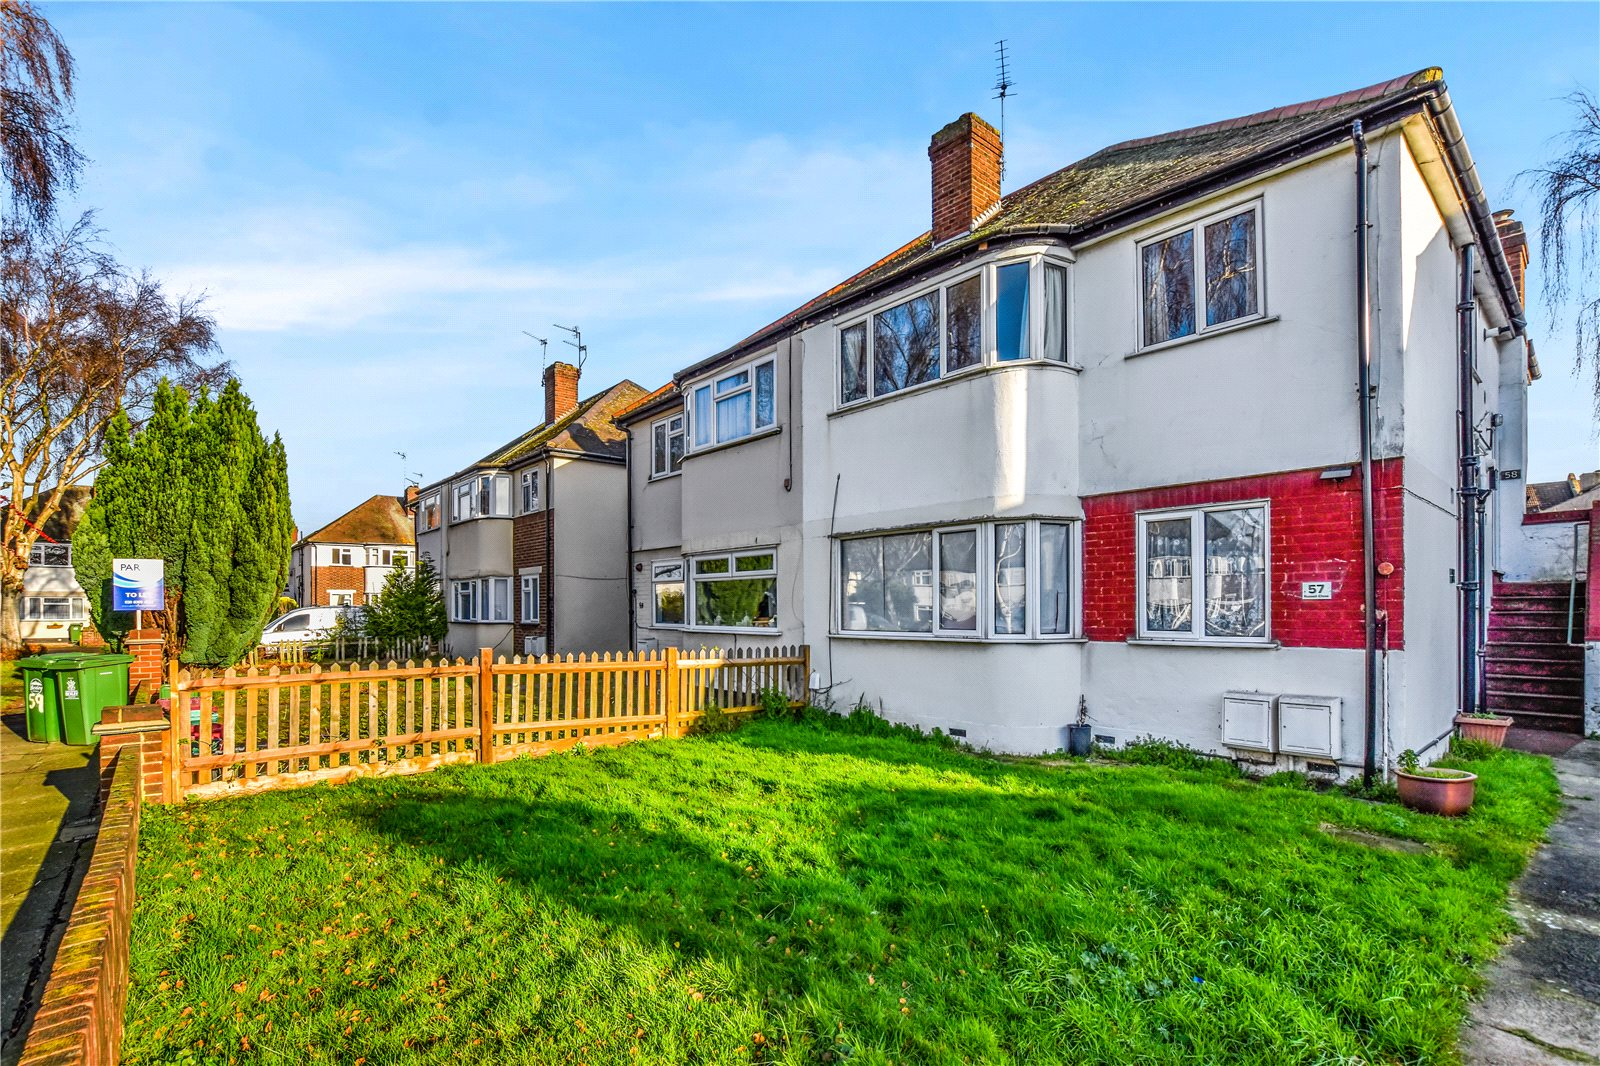 Russell Close, Bexleyheath, Kent, DA7